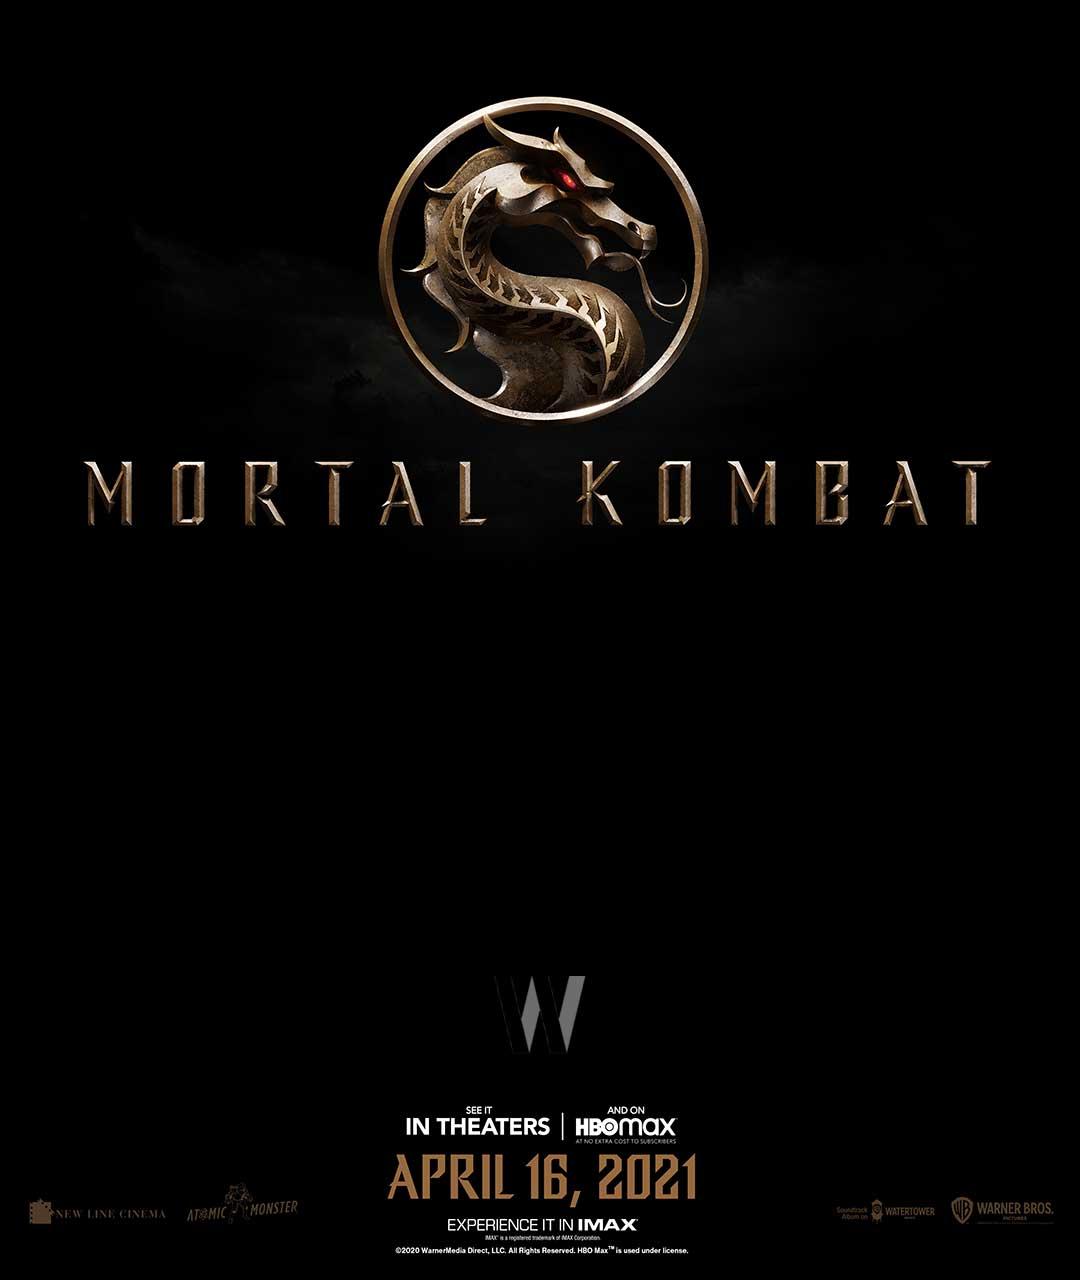 mortal-kombat-2021 film poster